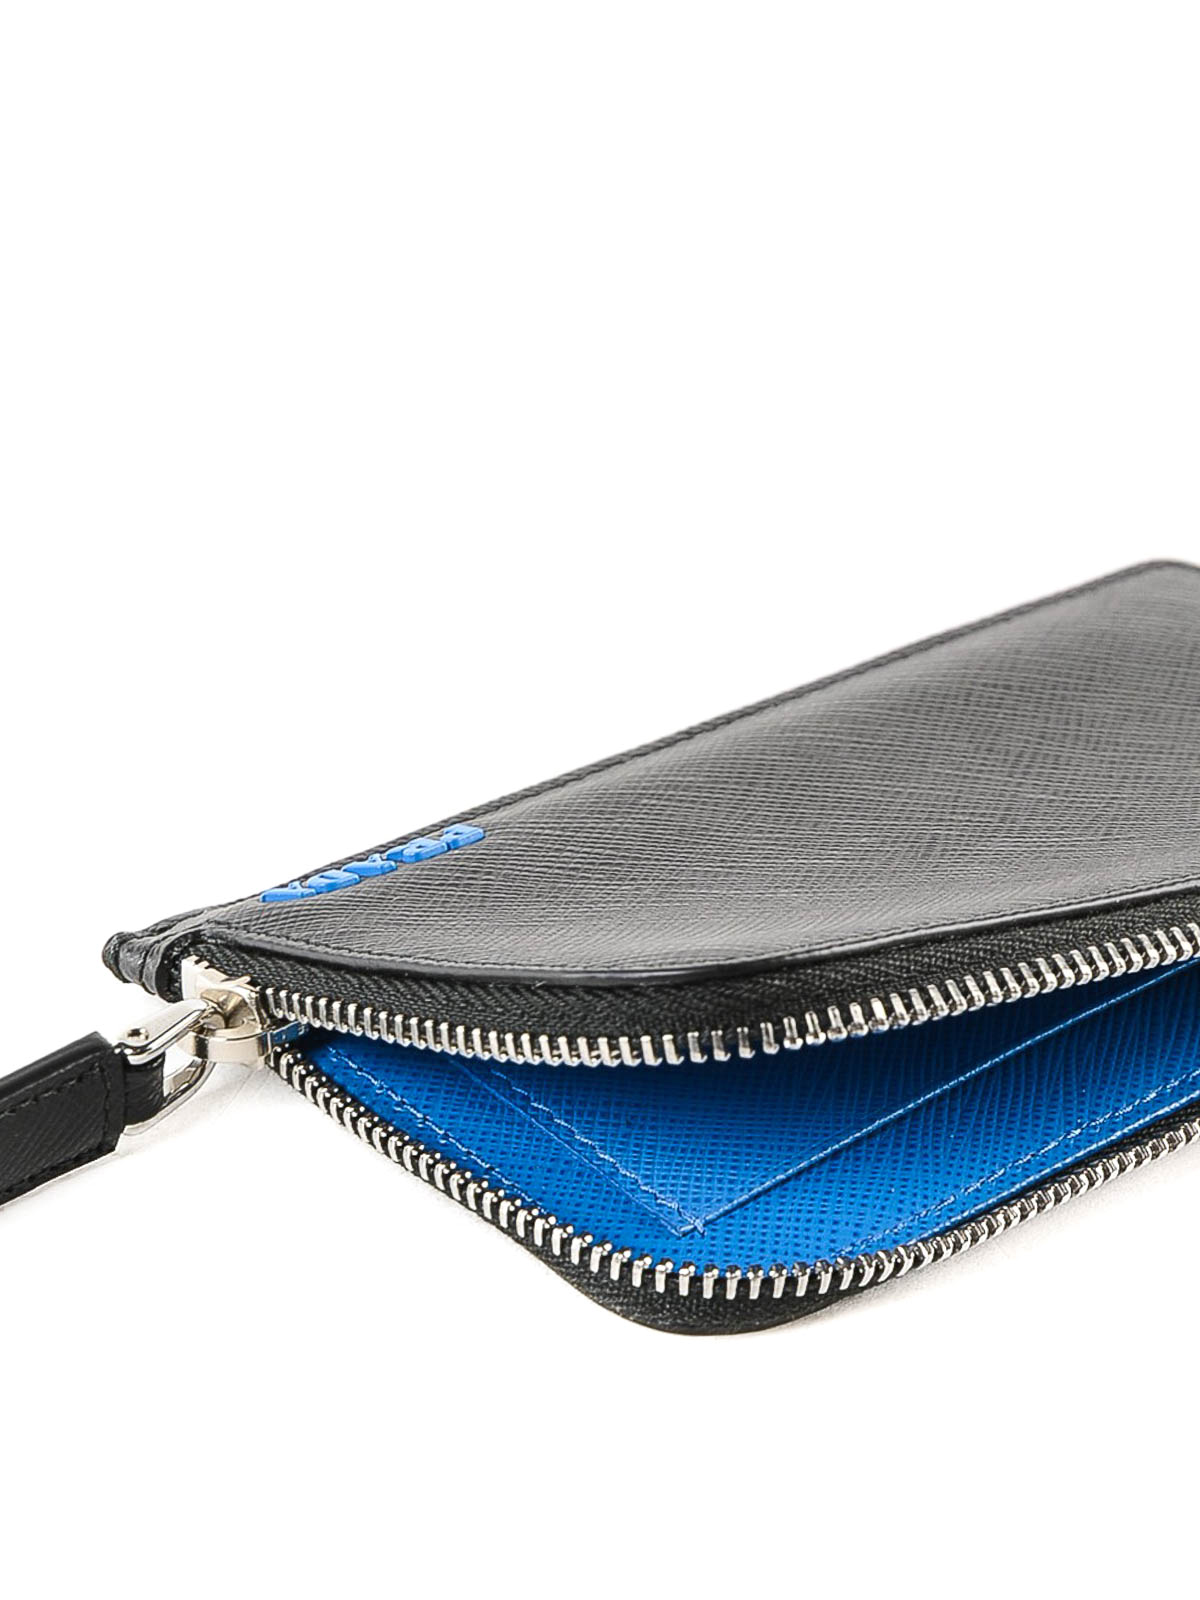 2c1a73ea719f Black and blue saffiano leather card holder shop online: PRADA. PRADA:  wallets & purses ...